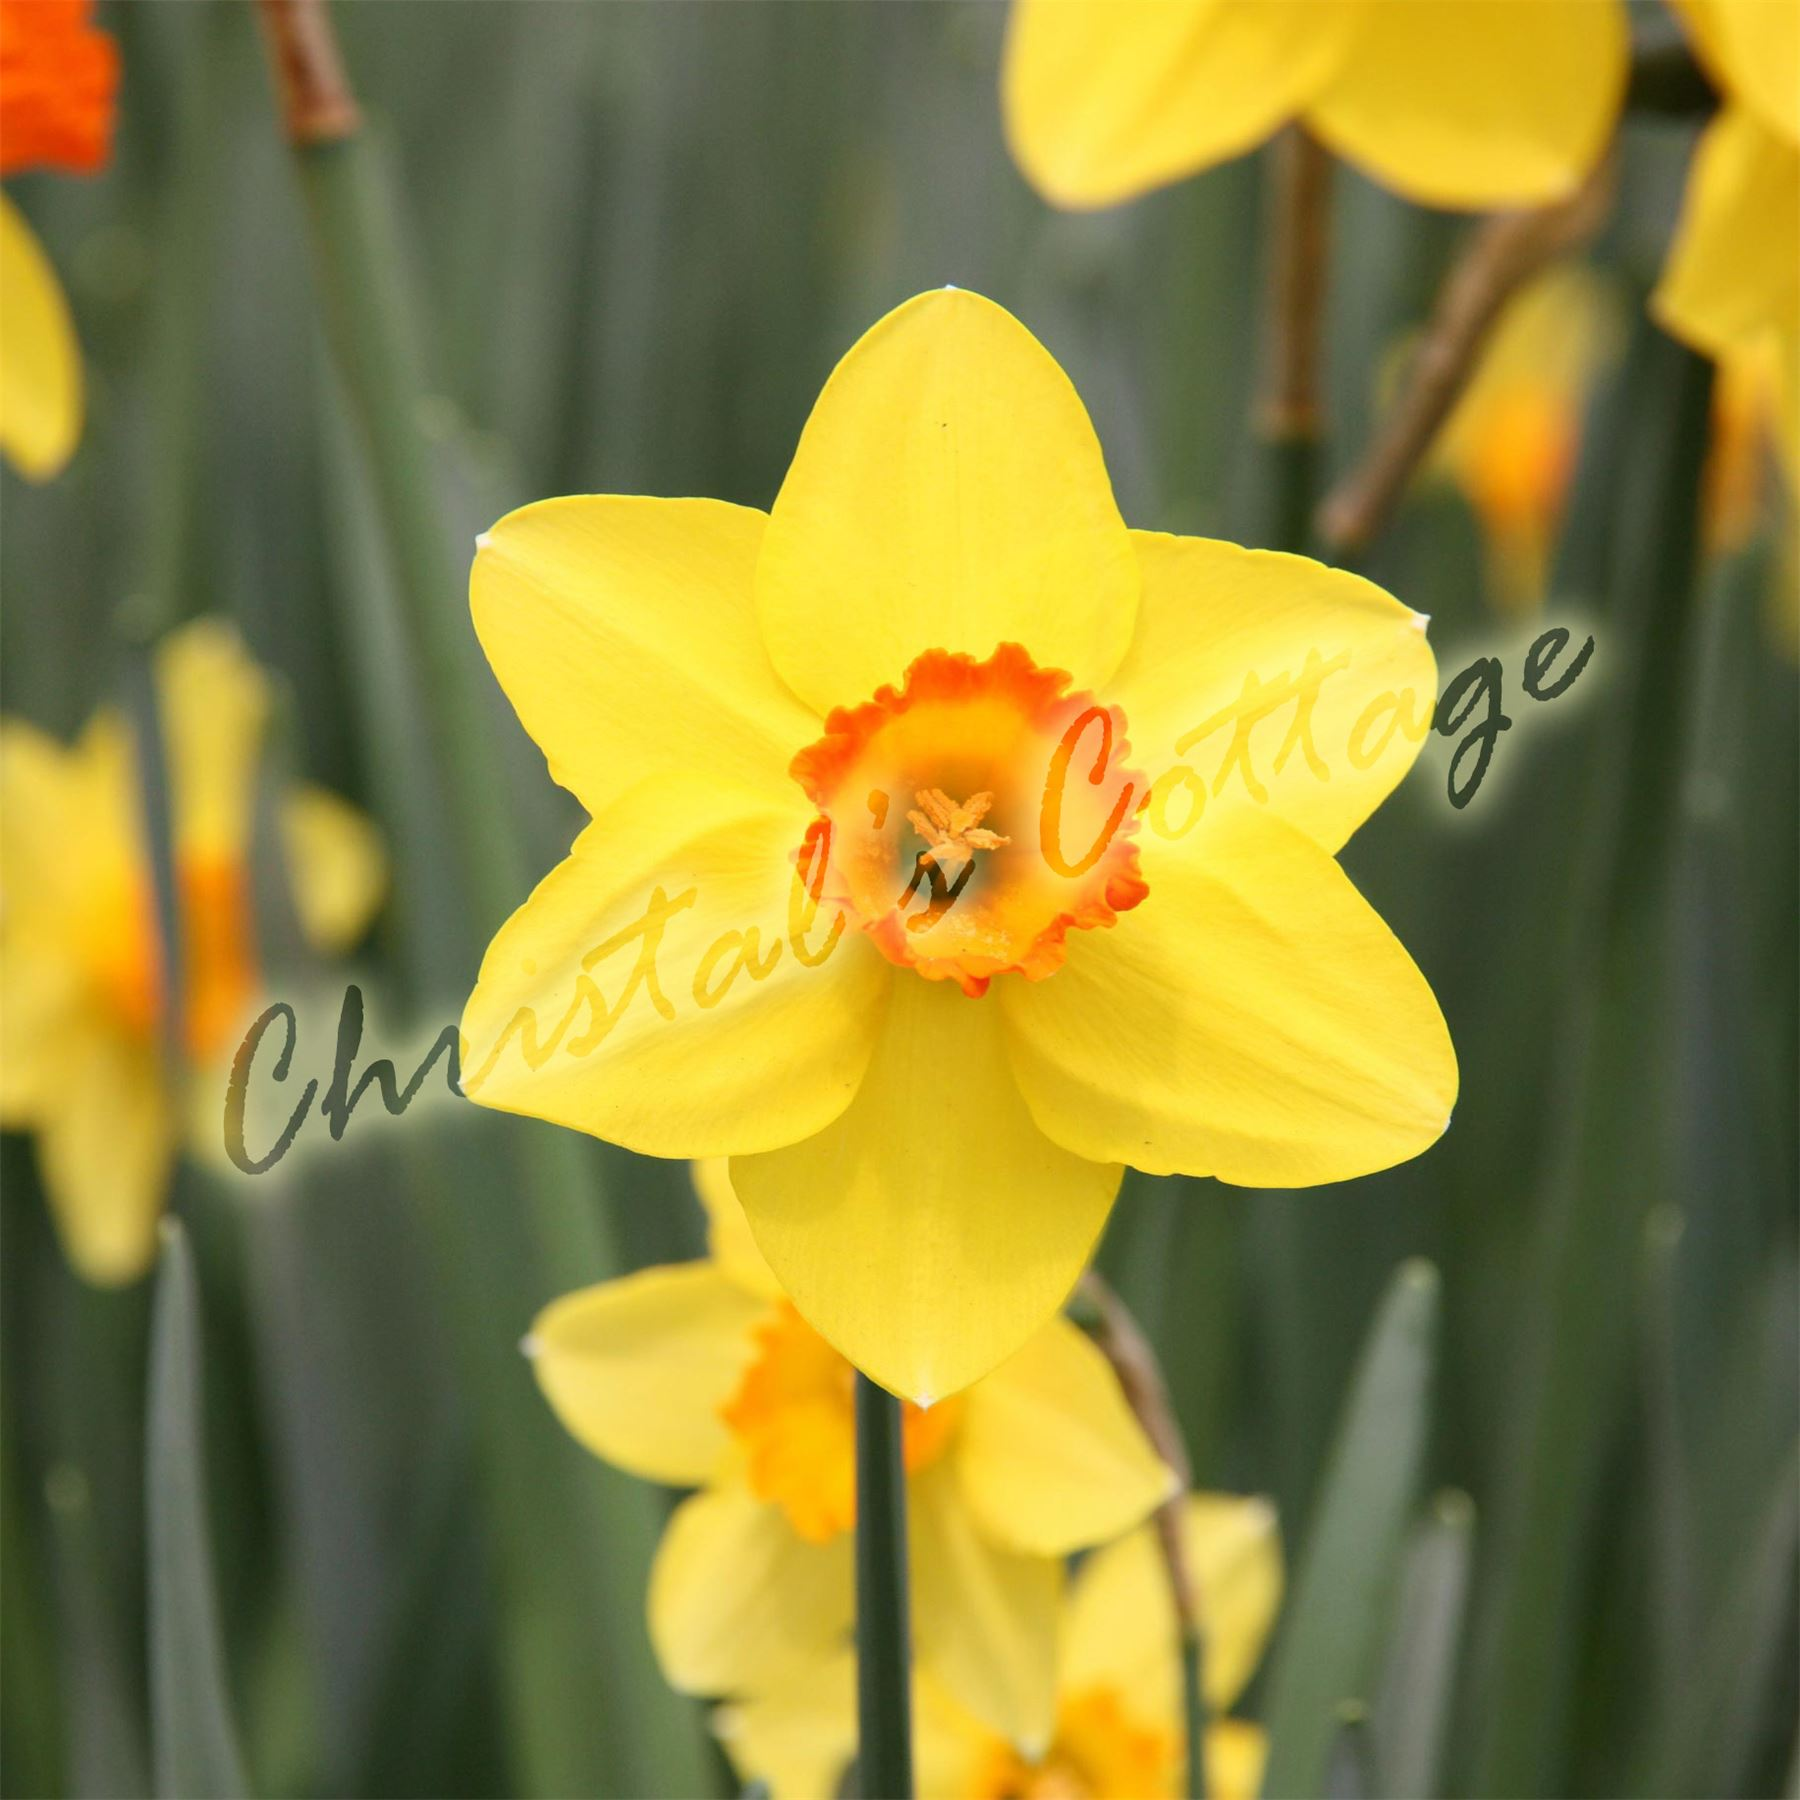 1 kg  20 Knollen gelb orange Blume Narzisse Narzissen